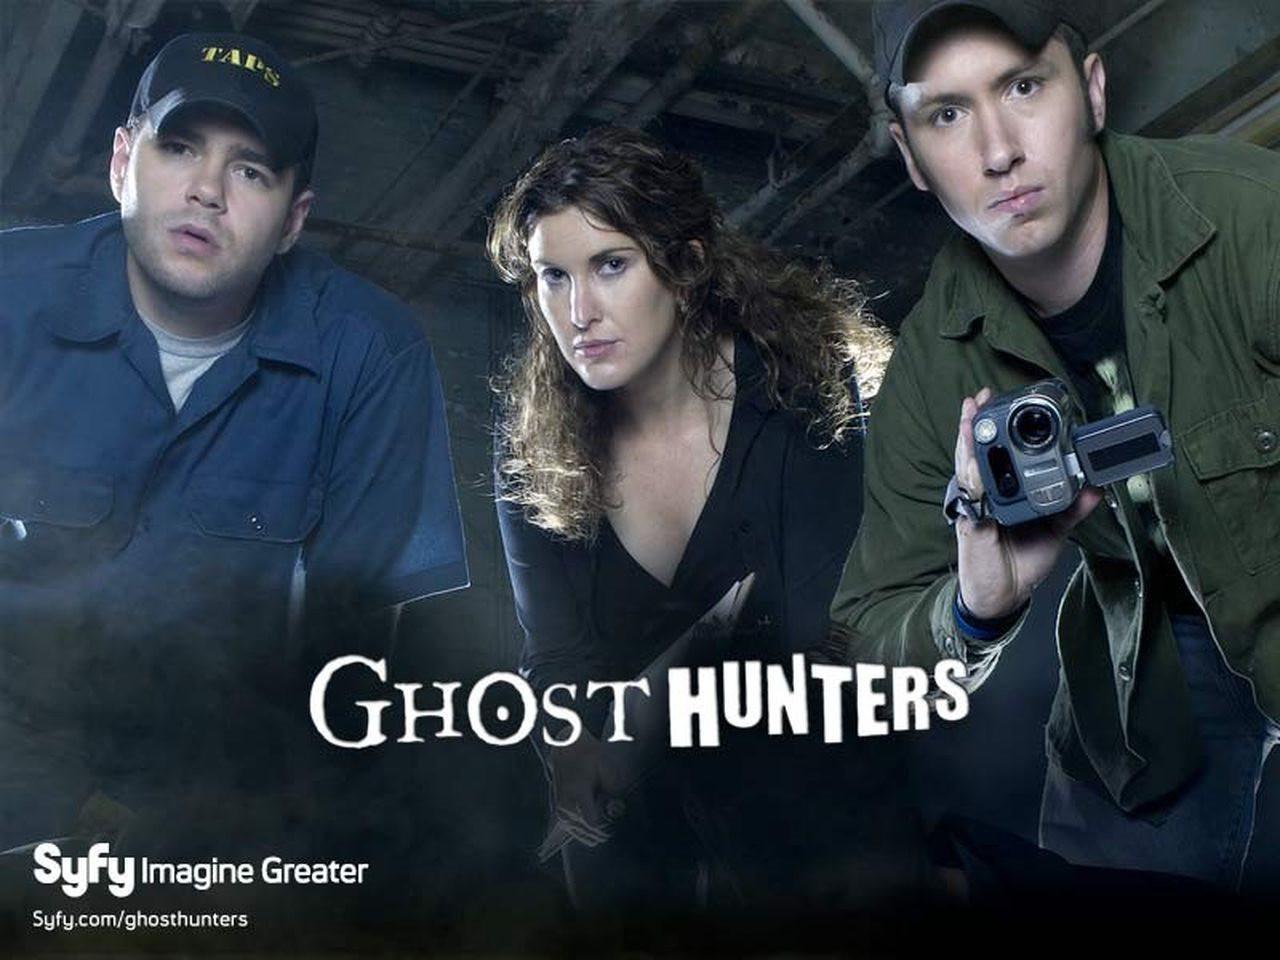 ghost-hunters-donnajpg-b9d7e47c9ce84db1.jpg